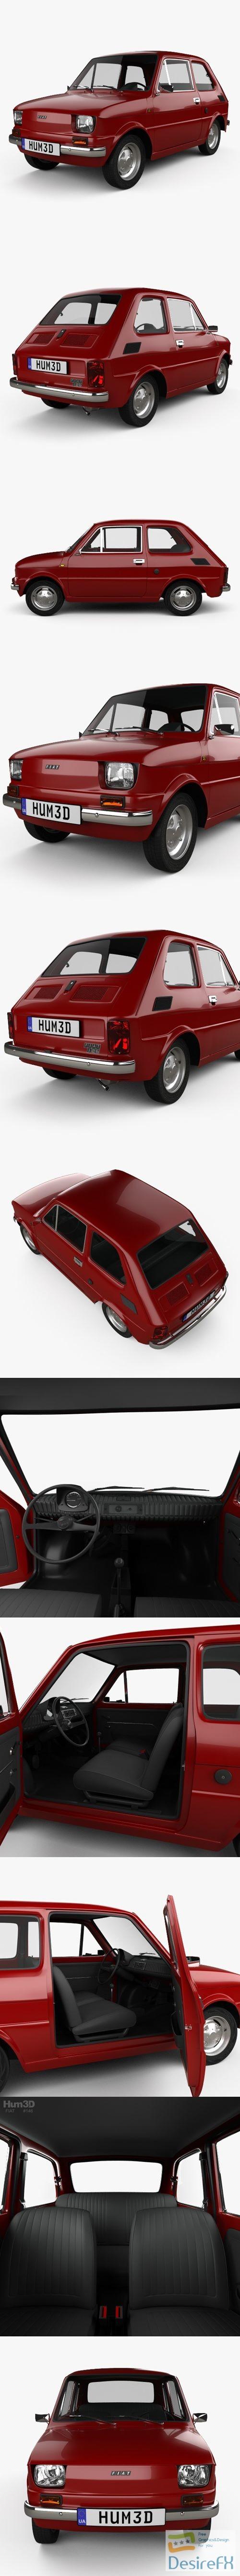 Fiat 126 with HQ interior 1976 3D Model